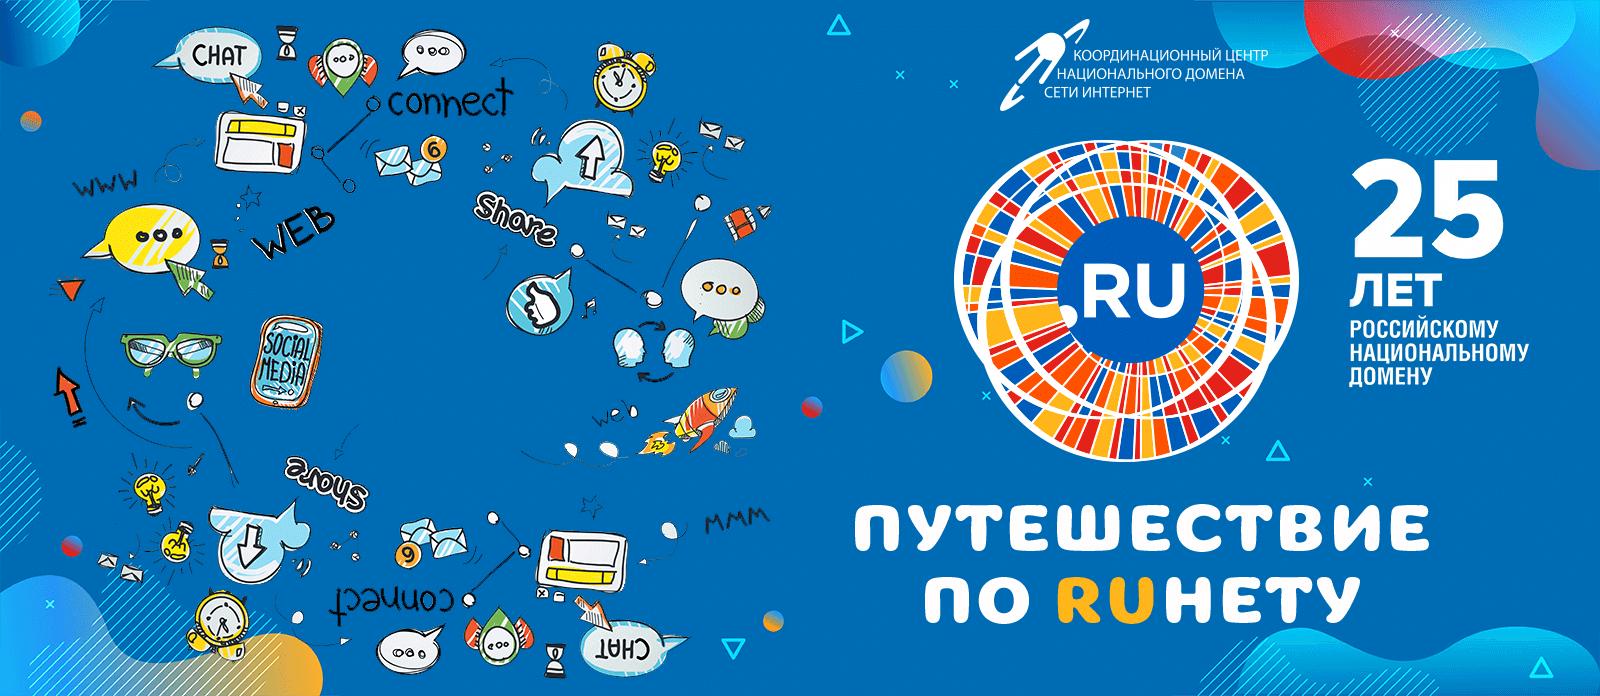 Путешествие по Ruнету